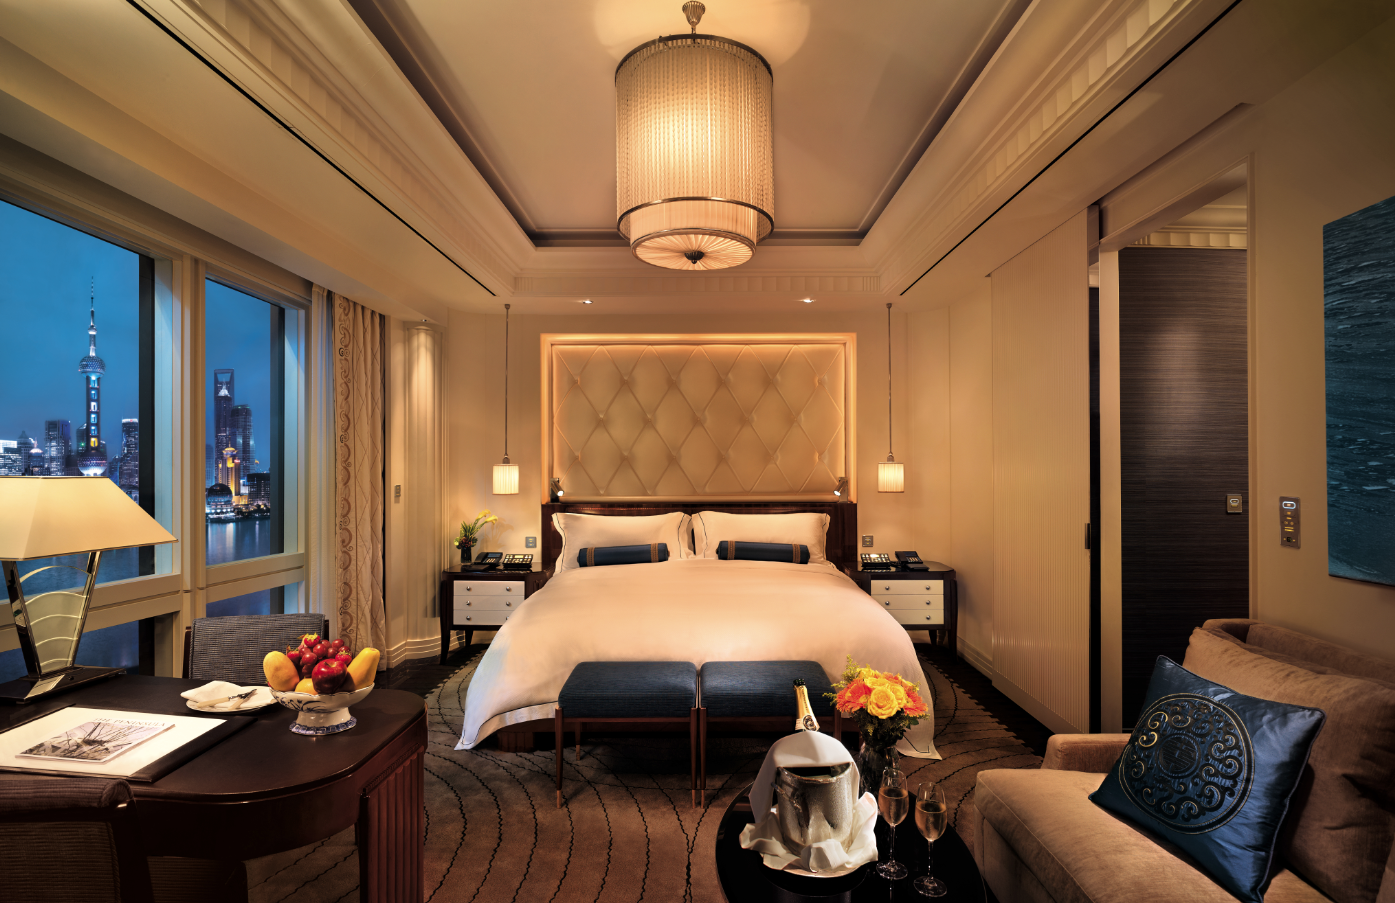 Uncategorized/luxury designer bedding/abernathy -  Tlworldsbest 2013 The Peninsula Shanghai The Gleaming Brass And Mohogany Interiors Of